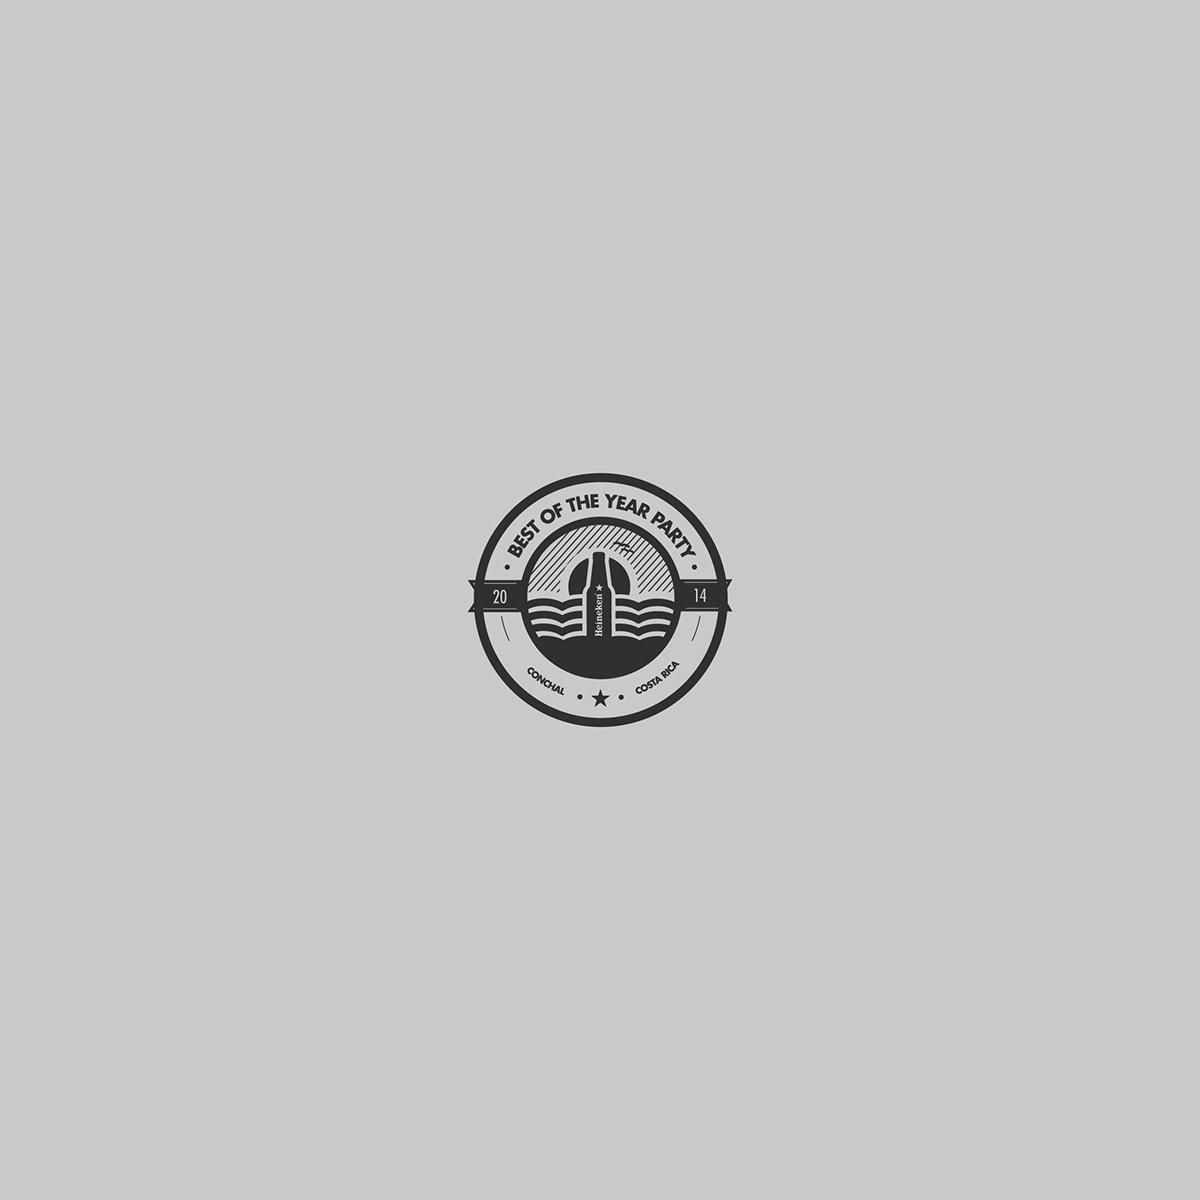 Jorge Espinoza 标志设计作品合集,所属类别:标志设计、商标设计、LOGO设计 - 任刚 · Ren Gang 世界设计 · 设计世界